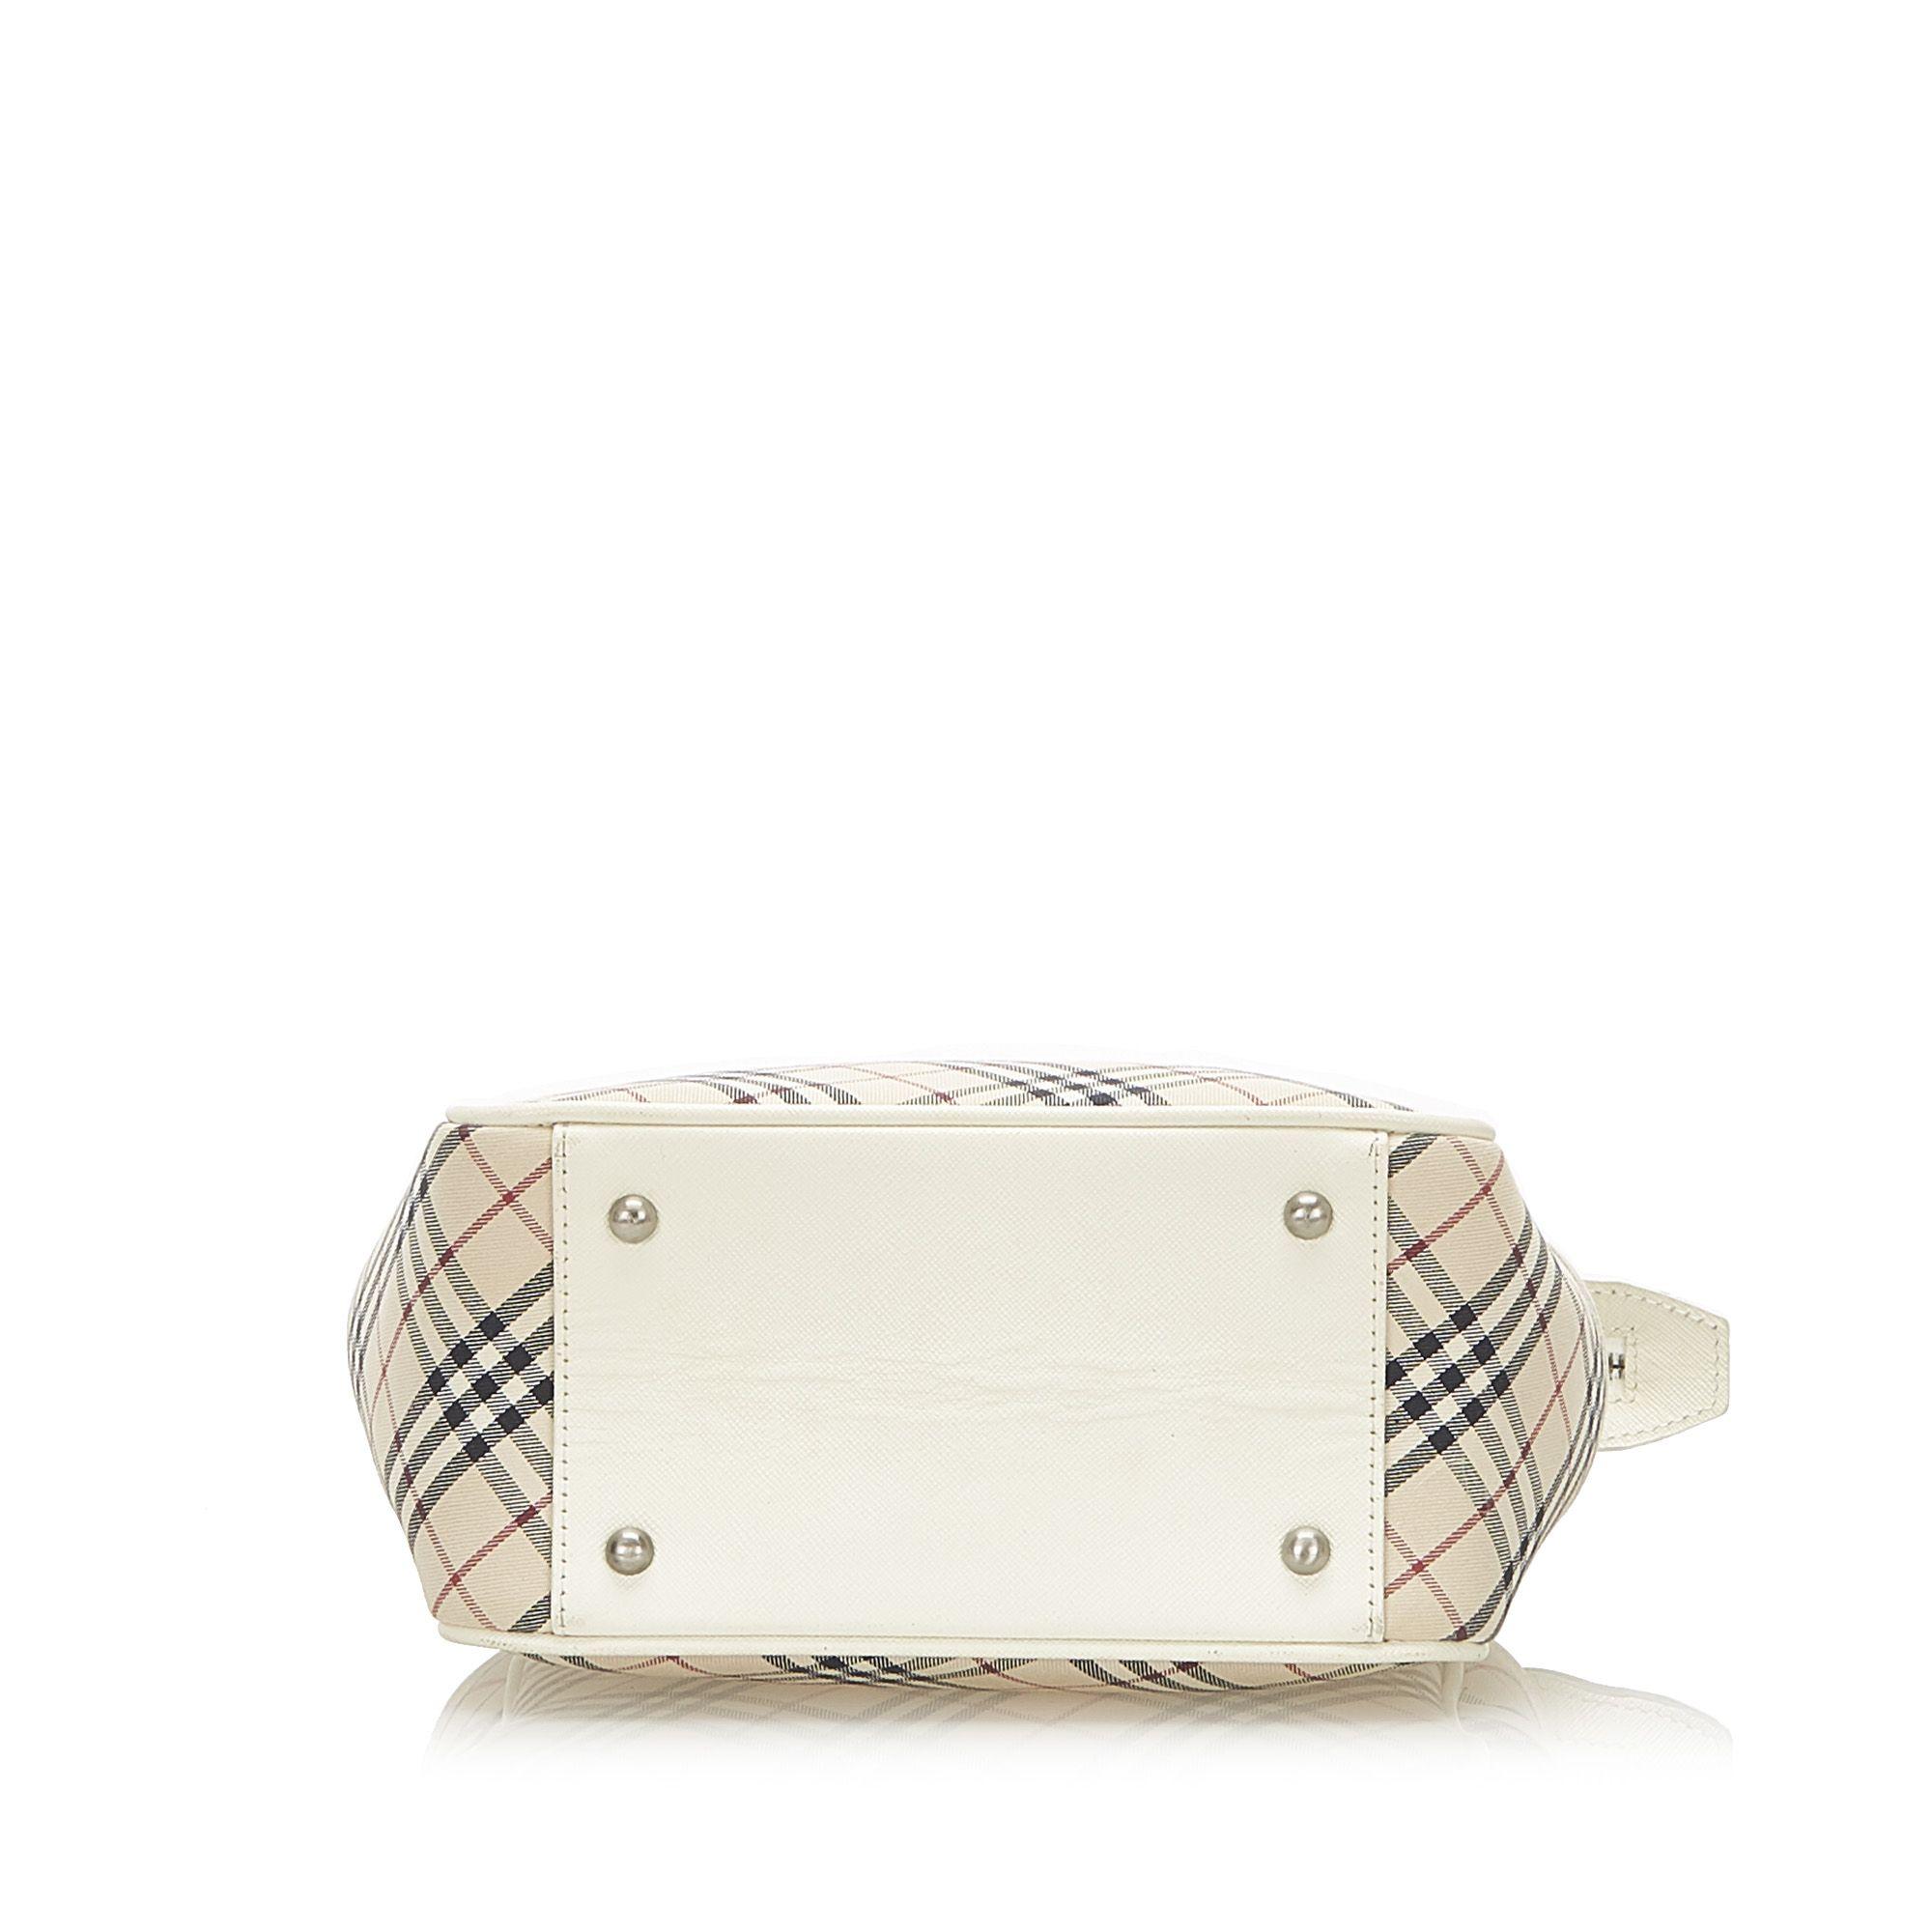 Vintage Burberry Nova Check Canvas Handbag White